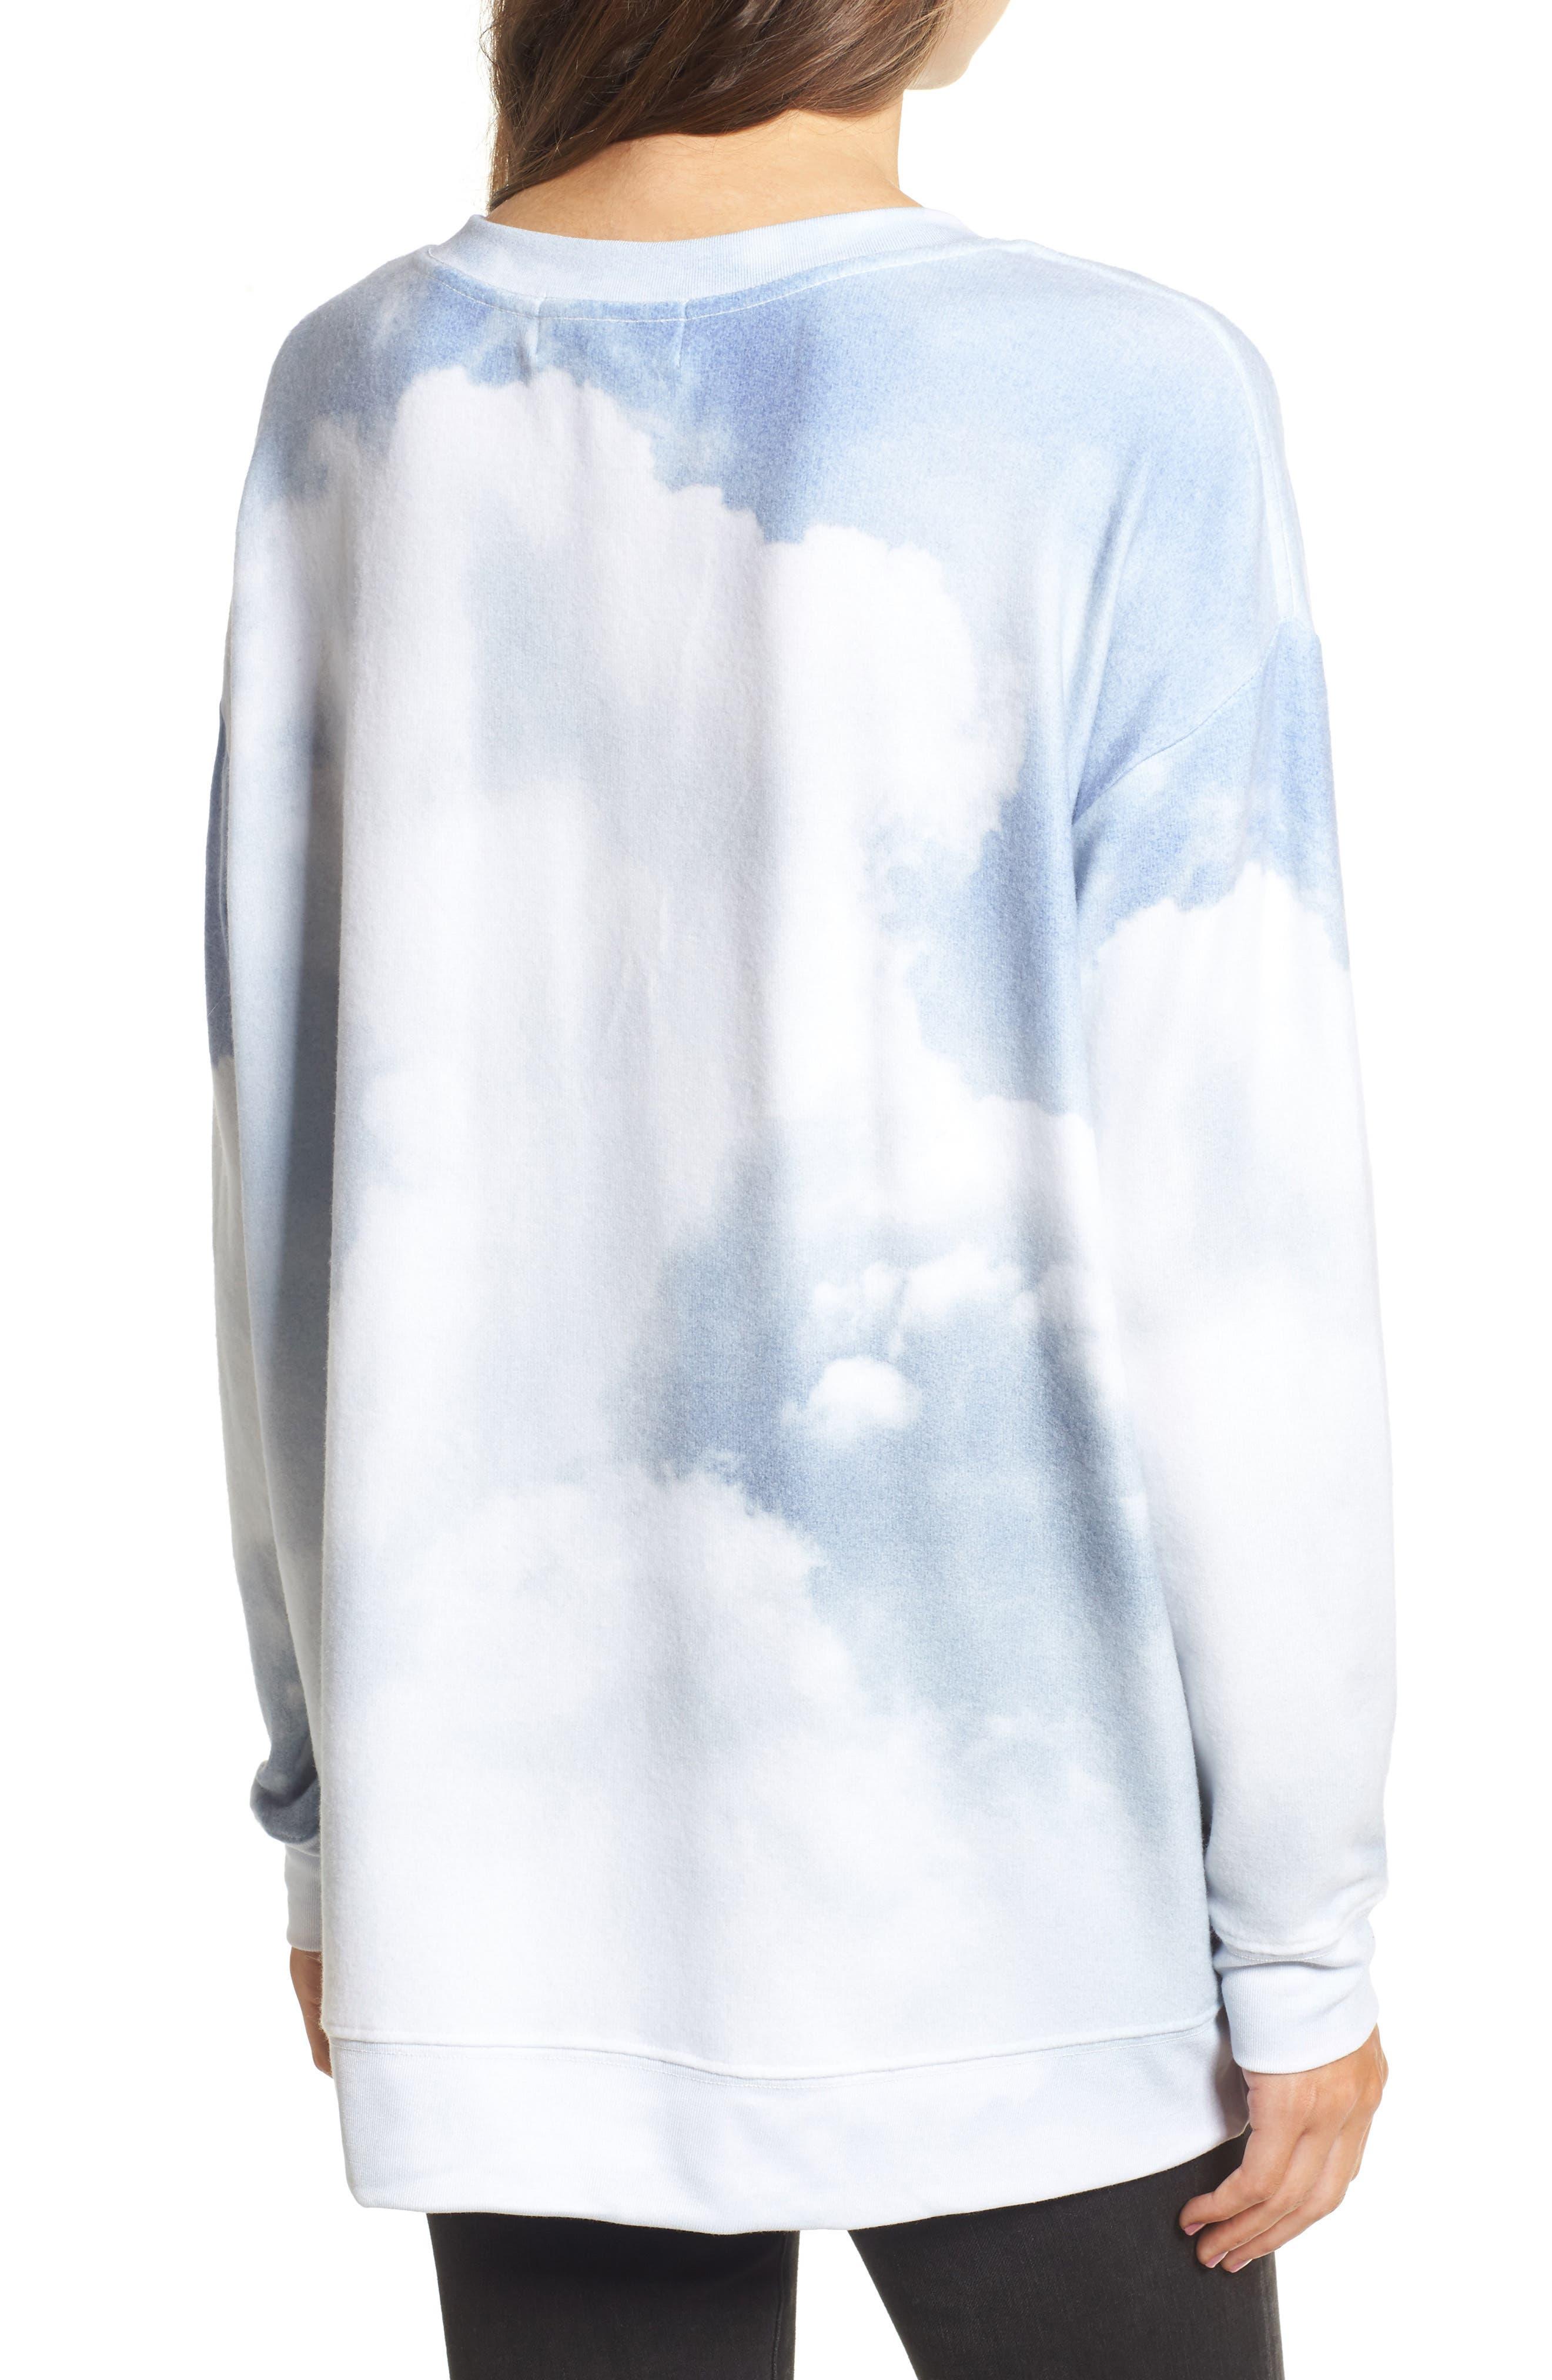 Heavens Roadtrip Sweatshirt,                             Alternate thumbnail 2, color,                             Multi